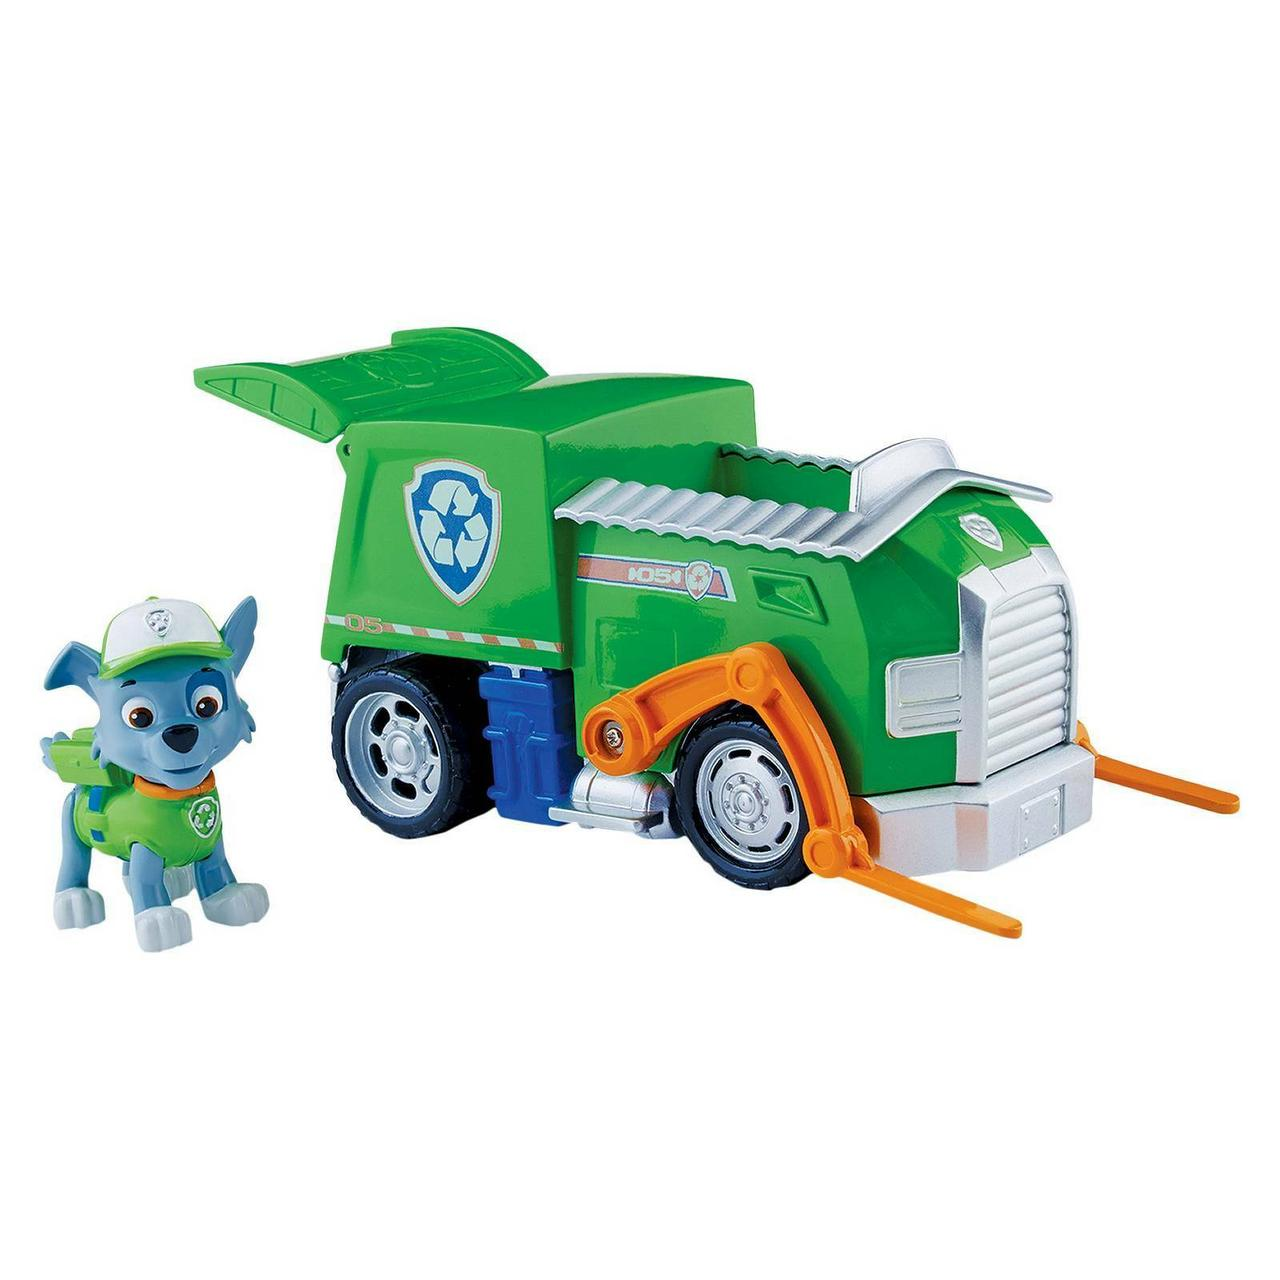 "Спасательный автомобиль Рокки, Spin Master, ""Щенячий Патруль"" - Paw Patrol, Back Opens, Roky`s Recycling Truck"